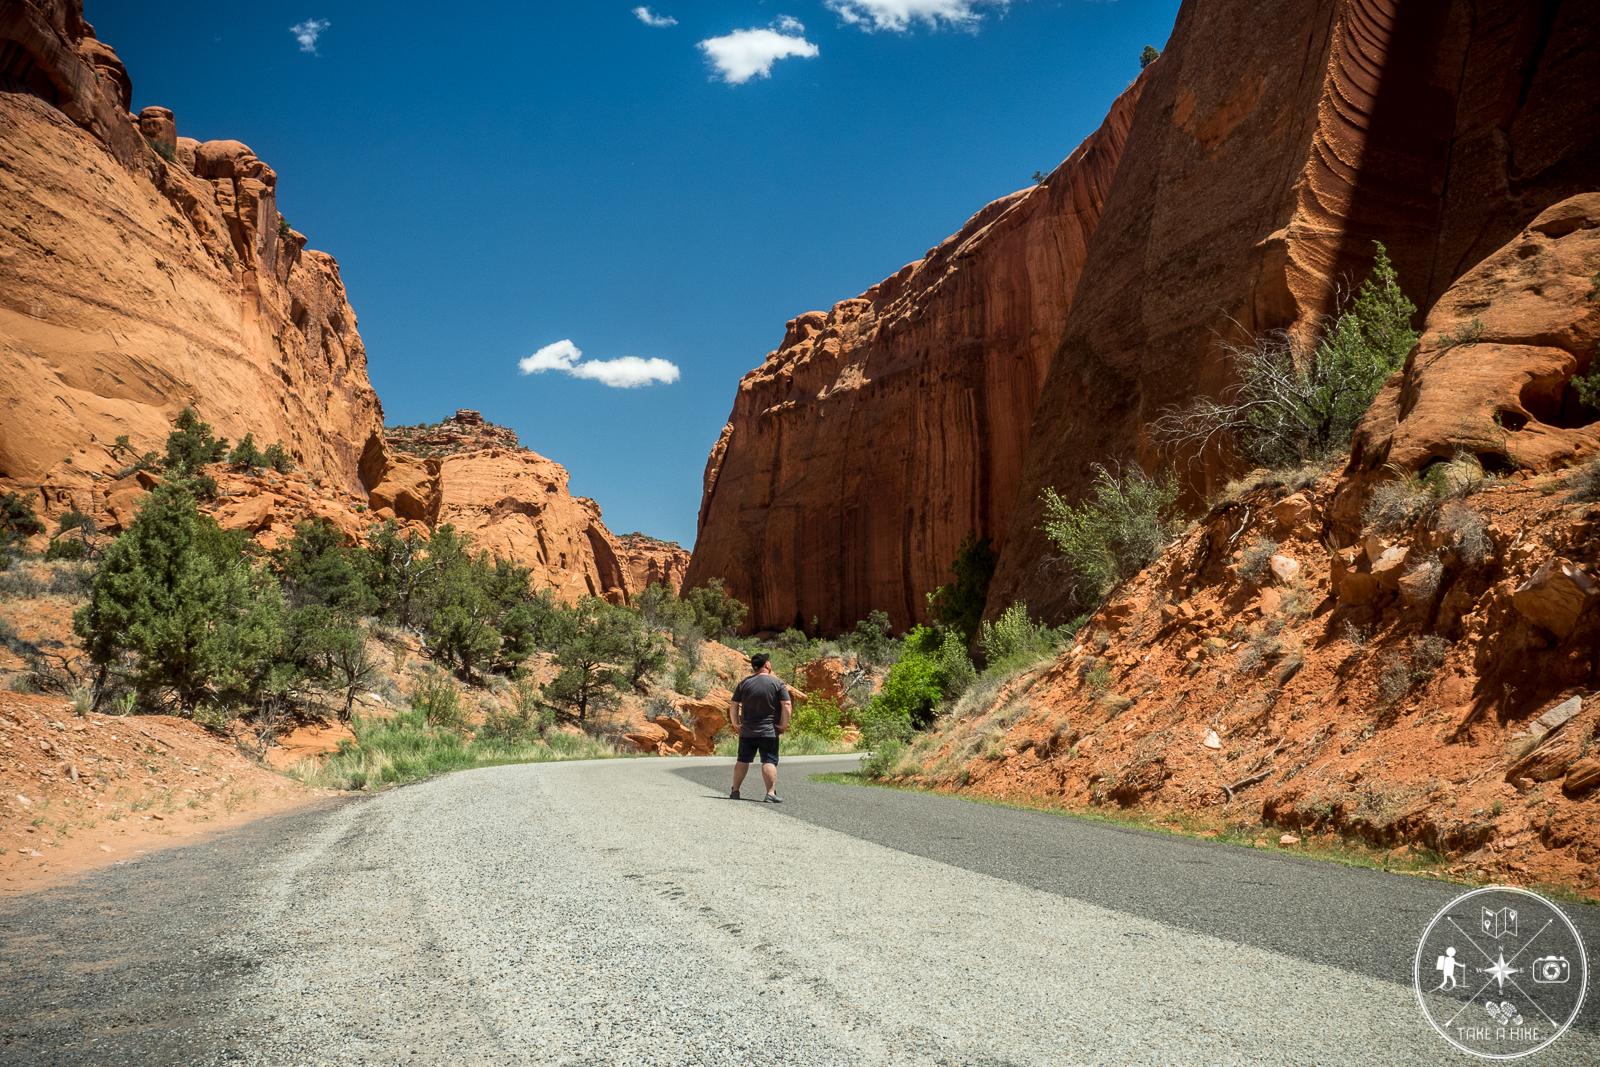 Long Canyon - ein bisschen Posing muss sein